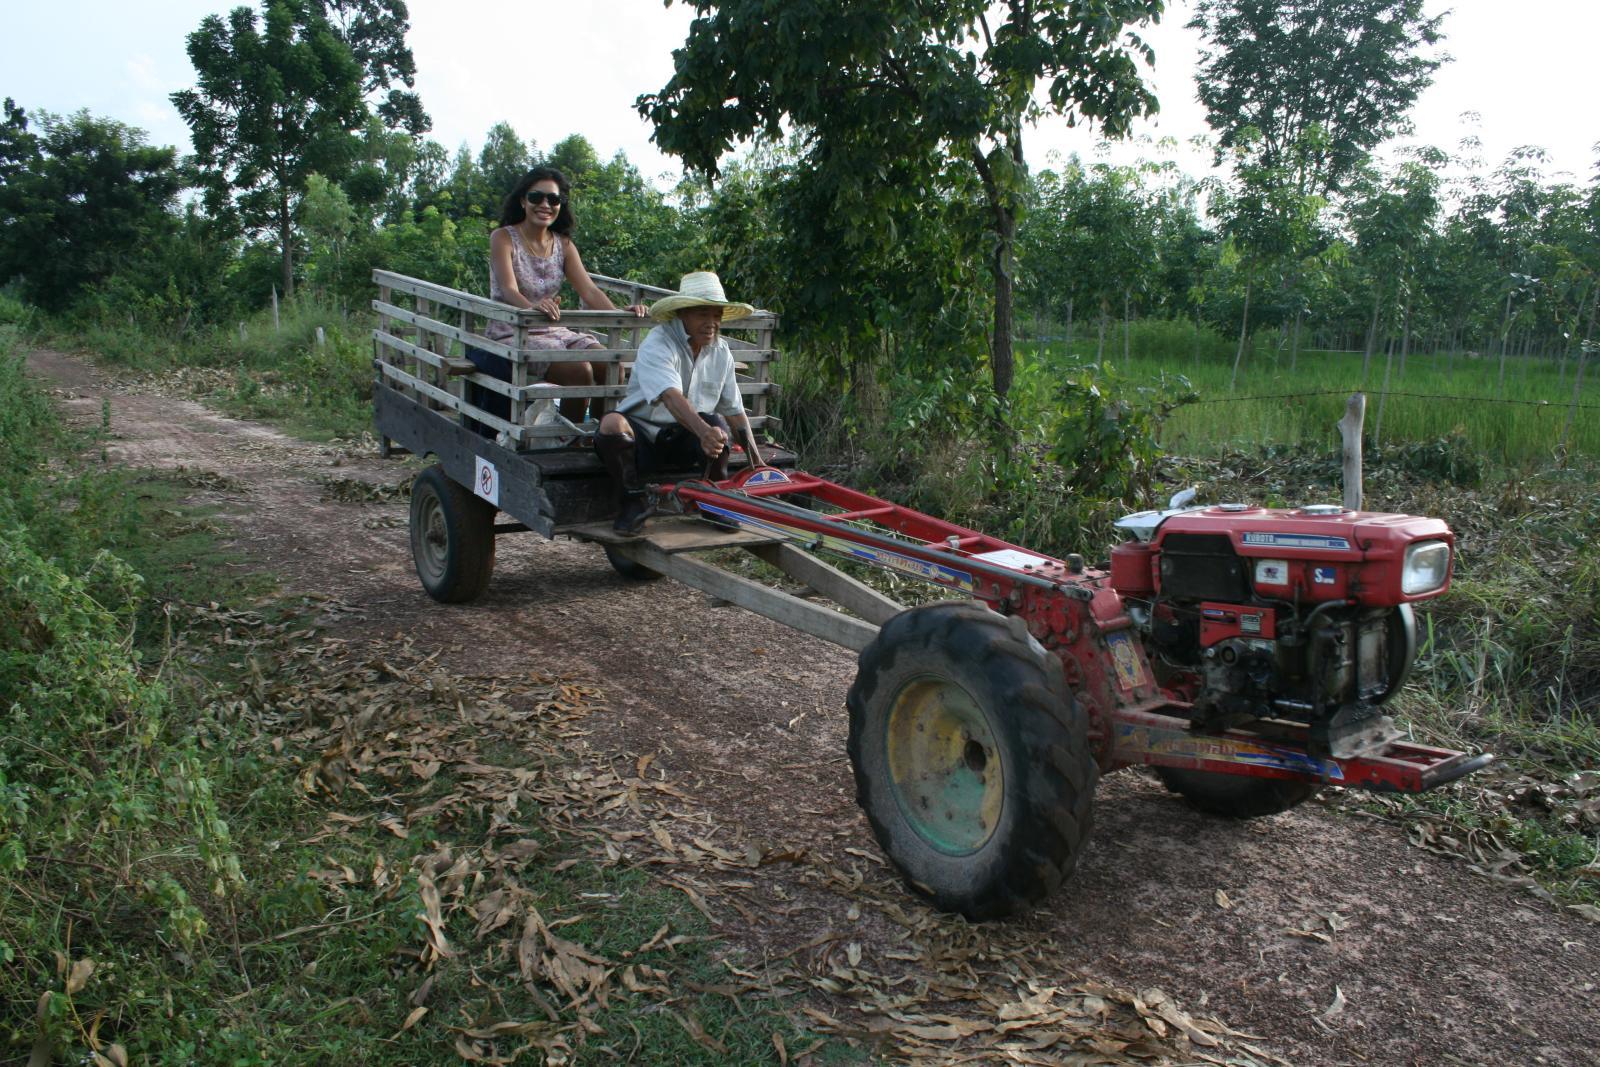 2 Wheel Tractor 1900 : File kubota two wheel tractor in thailand g wikimedia